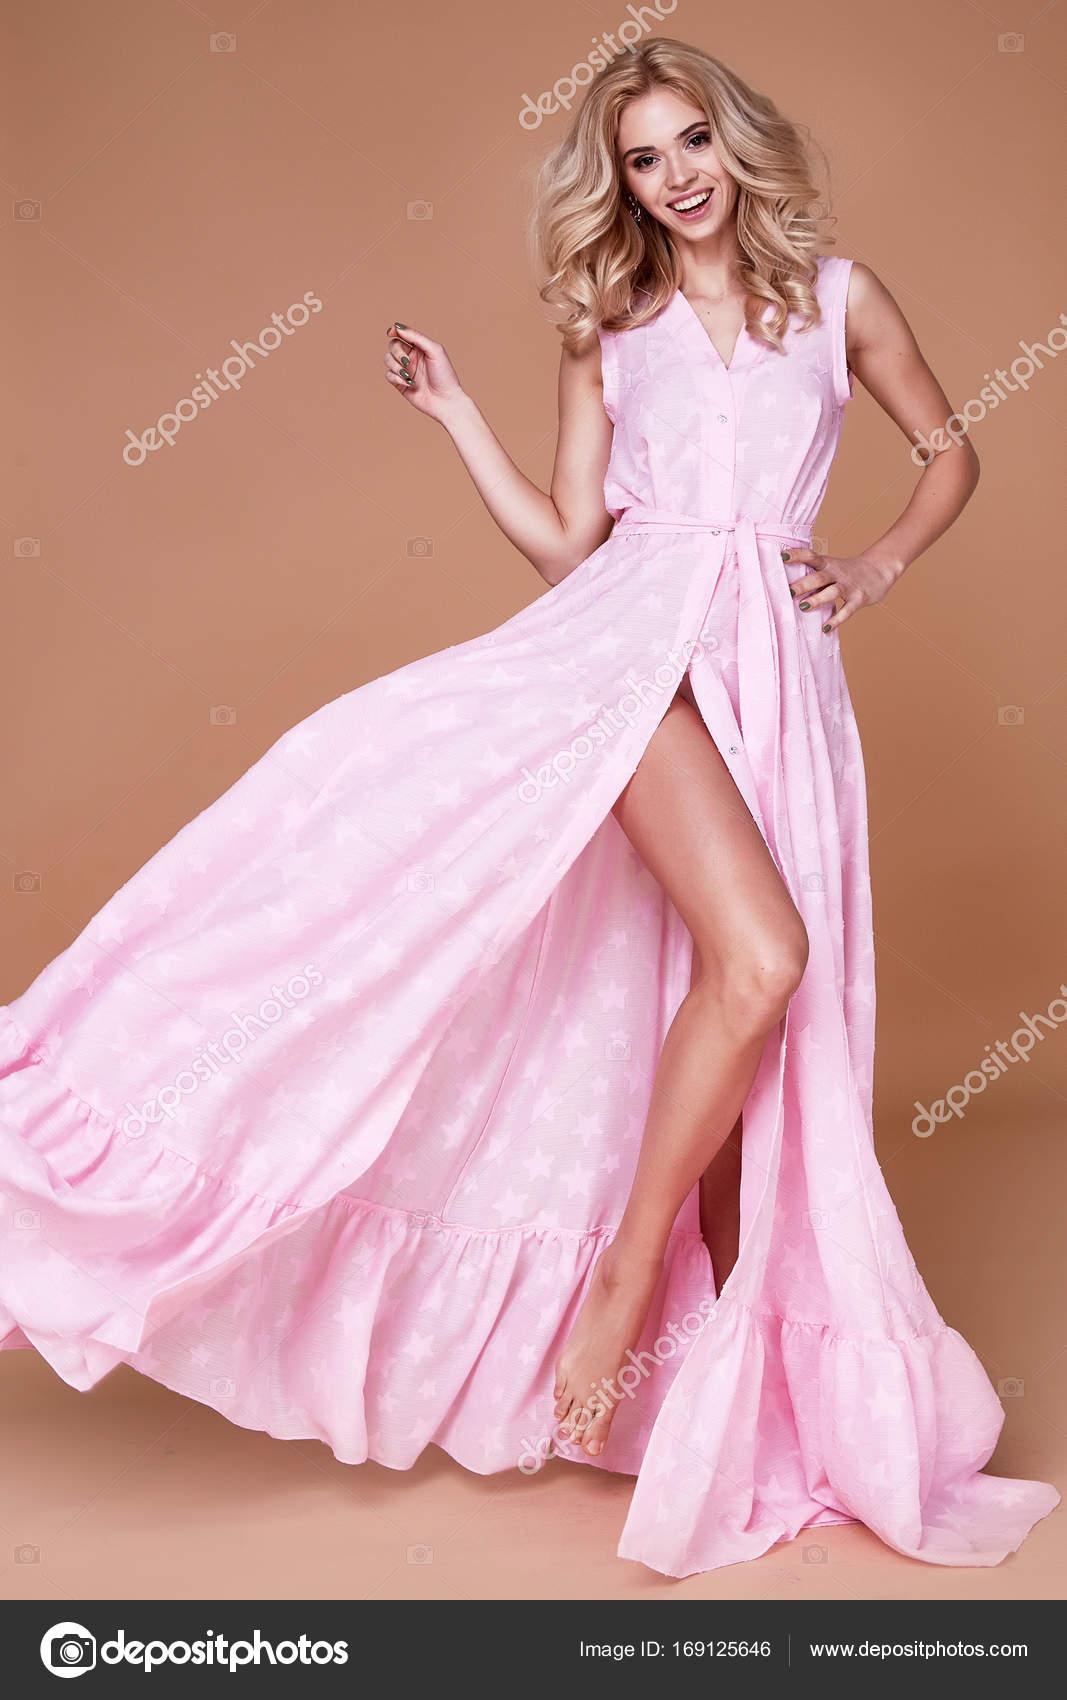 d601f861e75f Η γυναίκα σέξι ομορφιά αντιμετωπίζουν αρκετά tan δέρμα φορούν ροζ μεταξωτό  φόρεμα πολύ κοκαλιάρικο σώμα σχήμα μακιγιάζ καλλυντικά καλοκαίρι συλλογή  studio ...